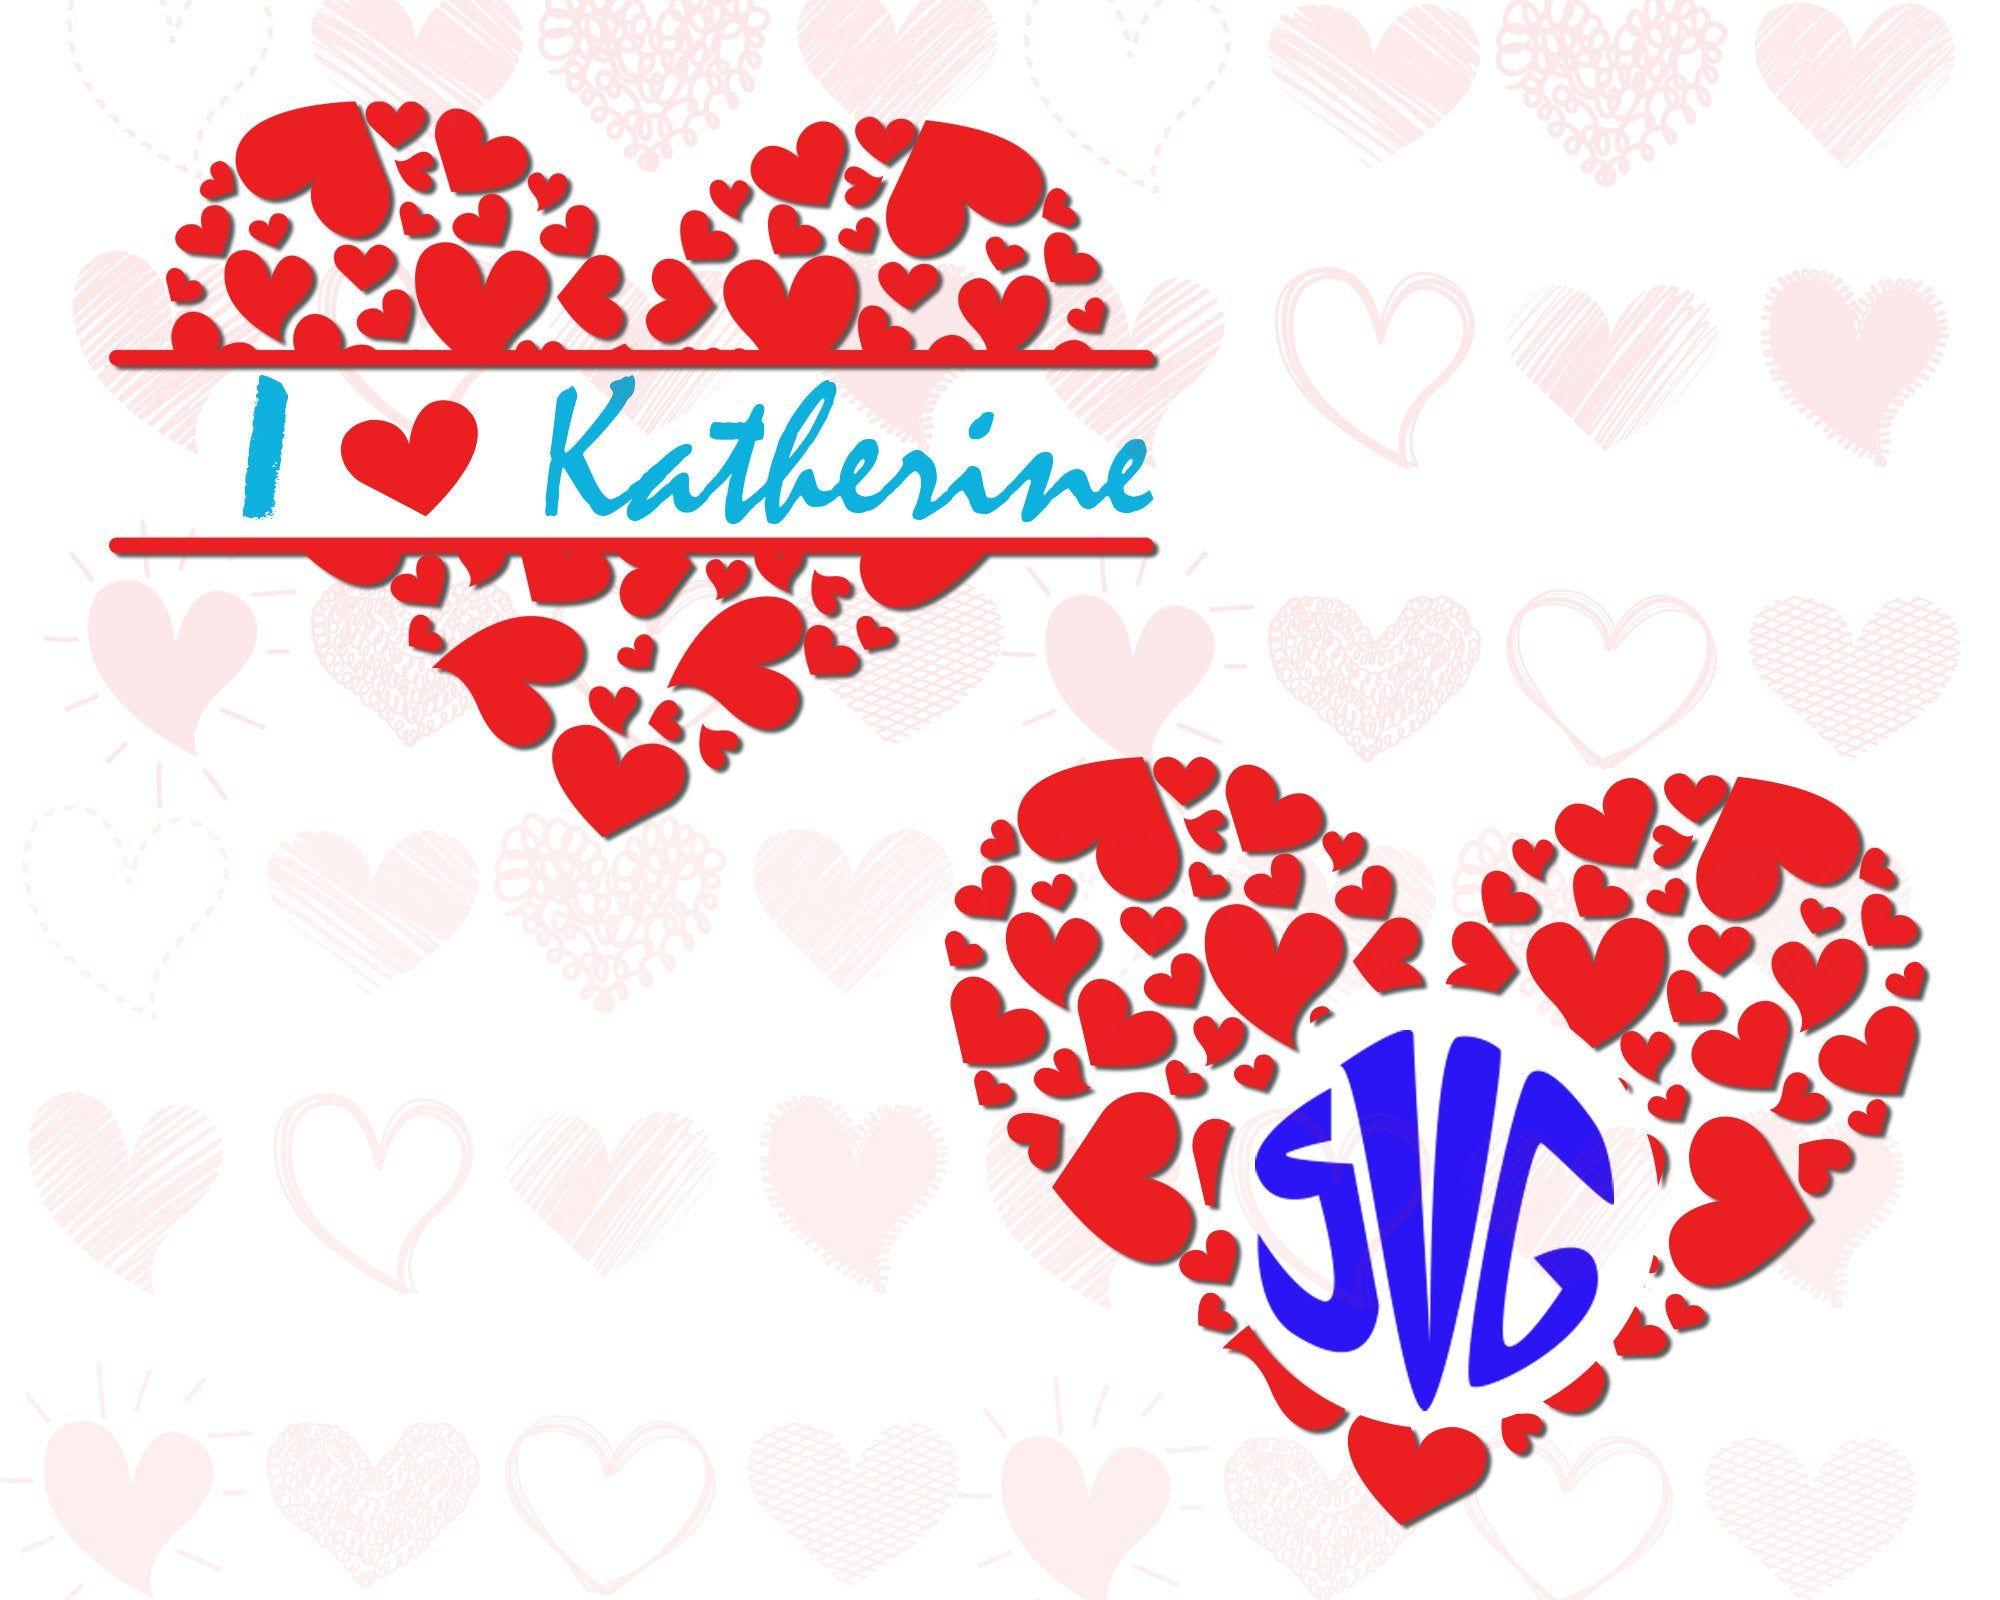 Heart Monogram Svg Valentine Monogram Frame Svg Hearts In Heart Monogram Frame Svg Valentine Frame Svg Cute Hea In 2020 Valentines Svg Valentines Frames Monogram Frame